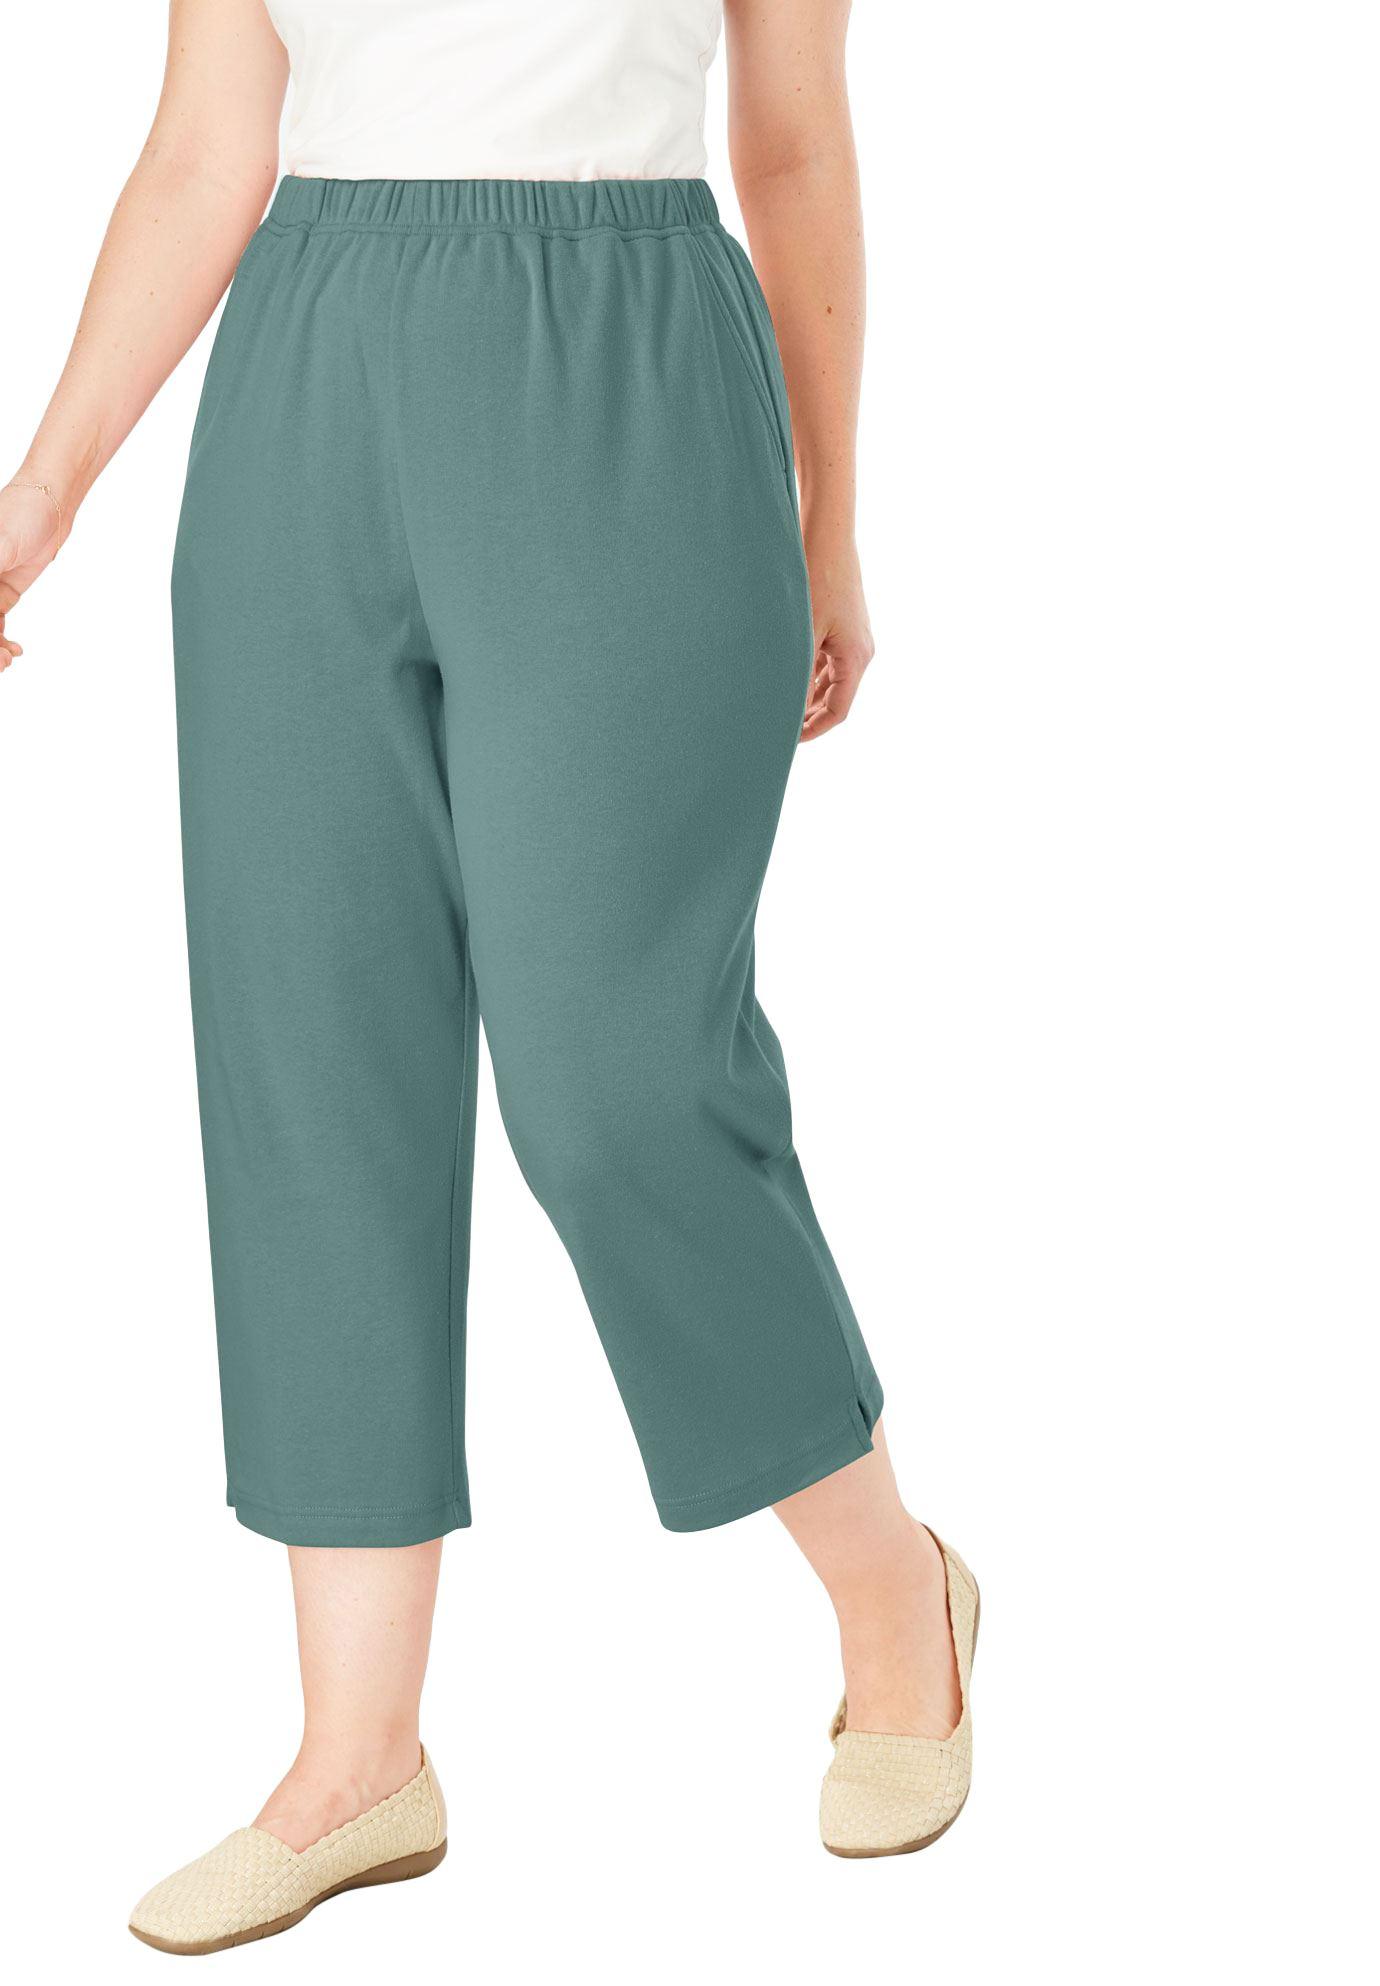 Woman Within Plus Size 7-day Knit Capri